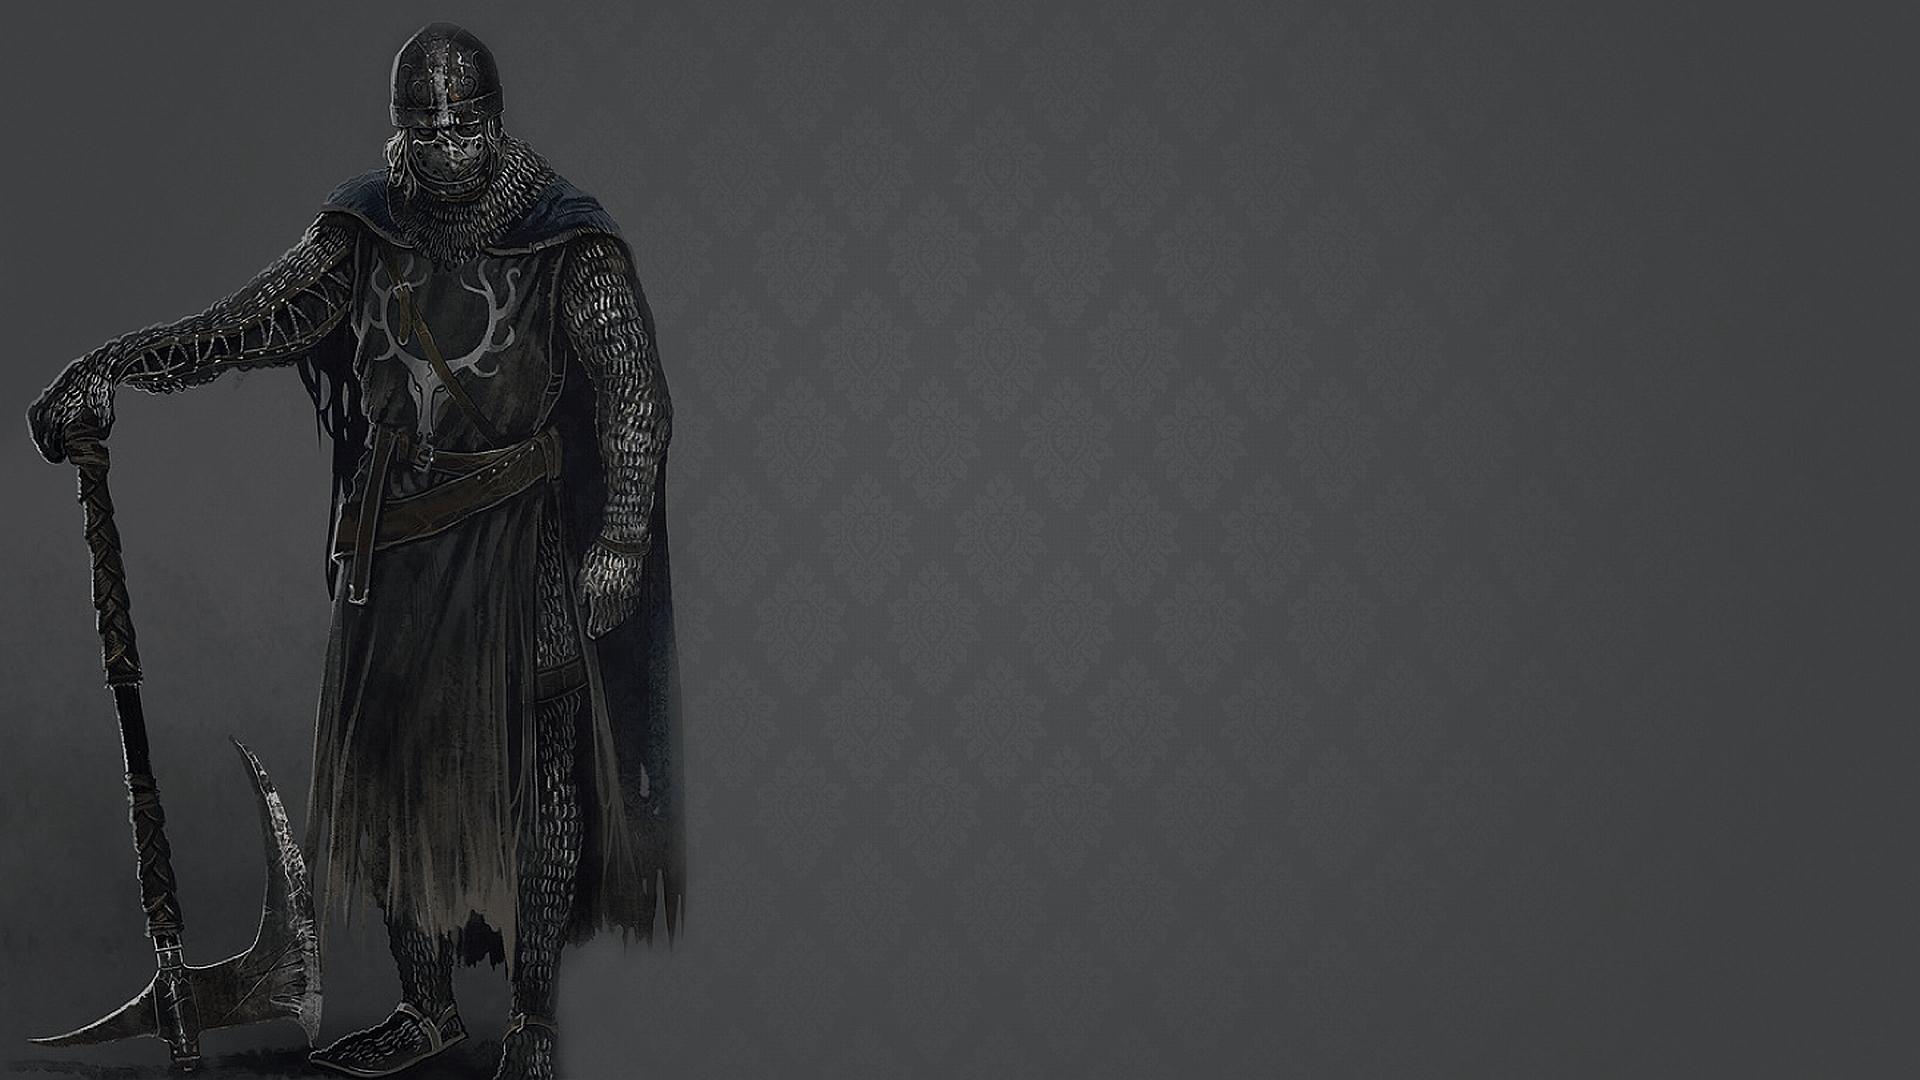 wallpaper.wiki-HD-Dark-Souls-2-Photos-Free-